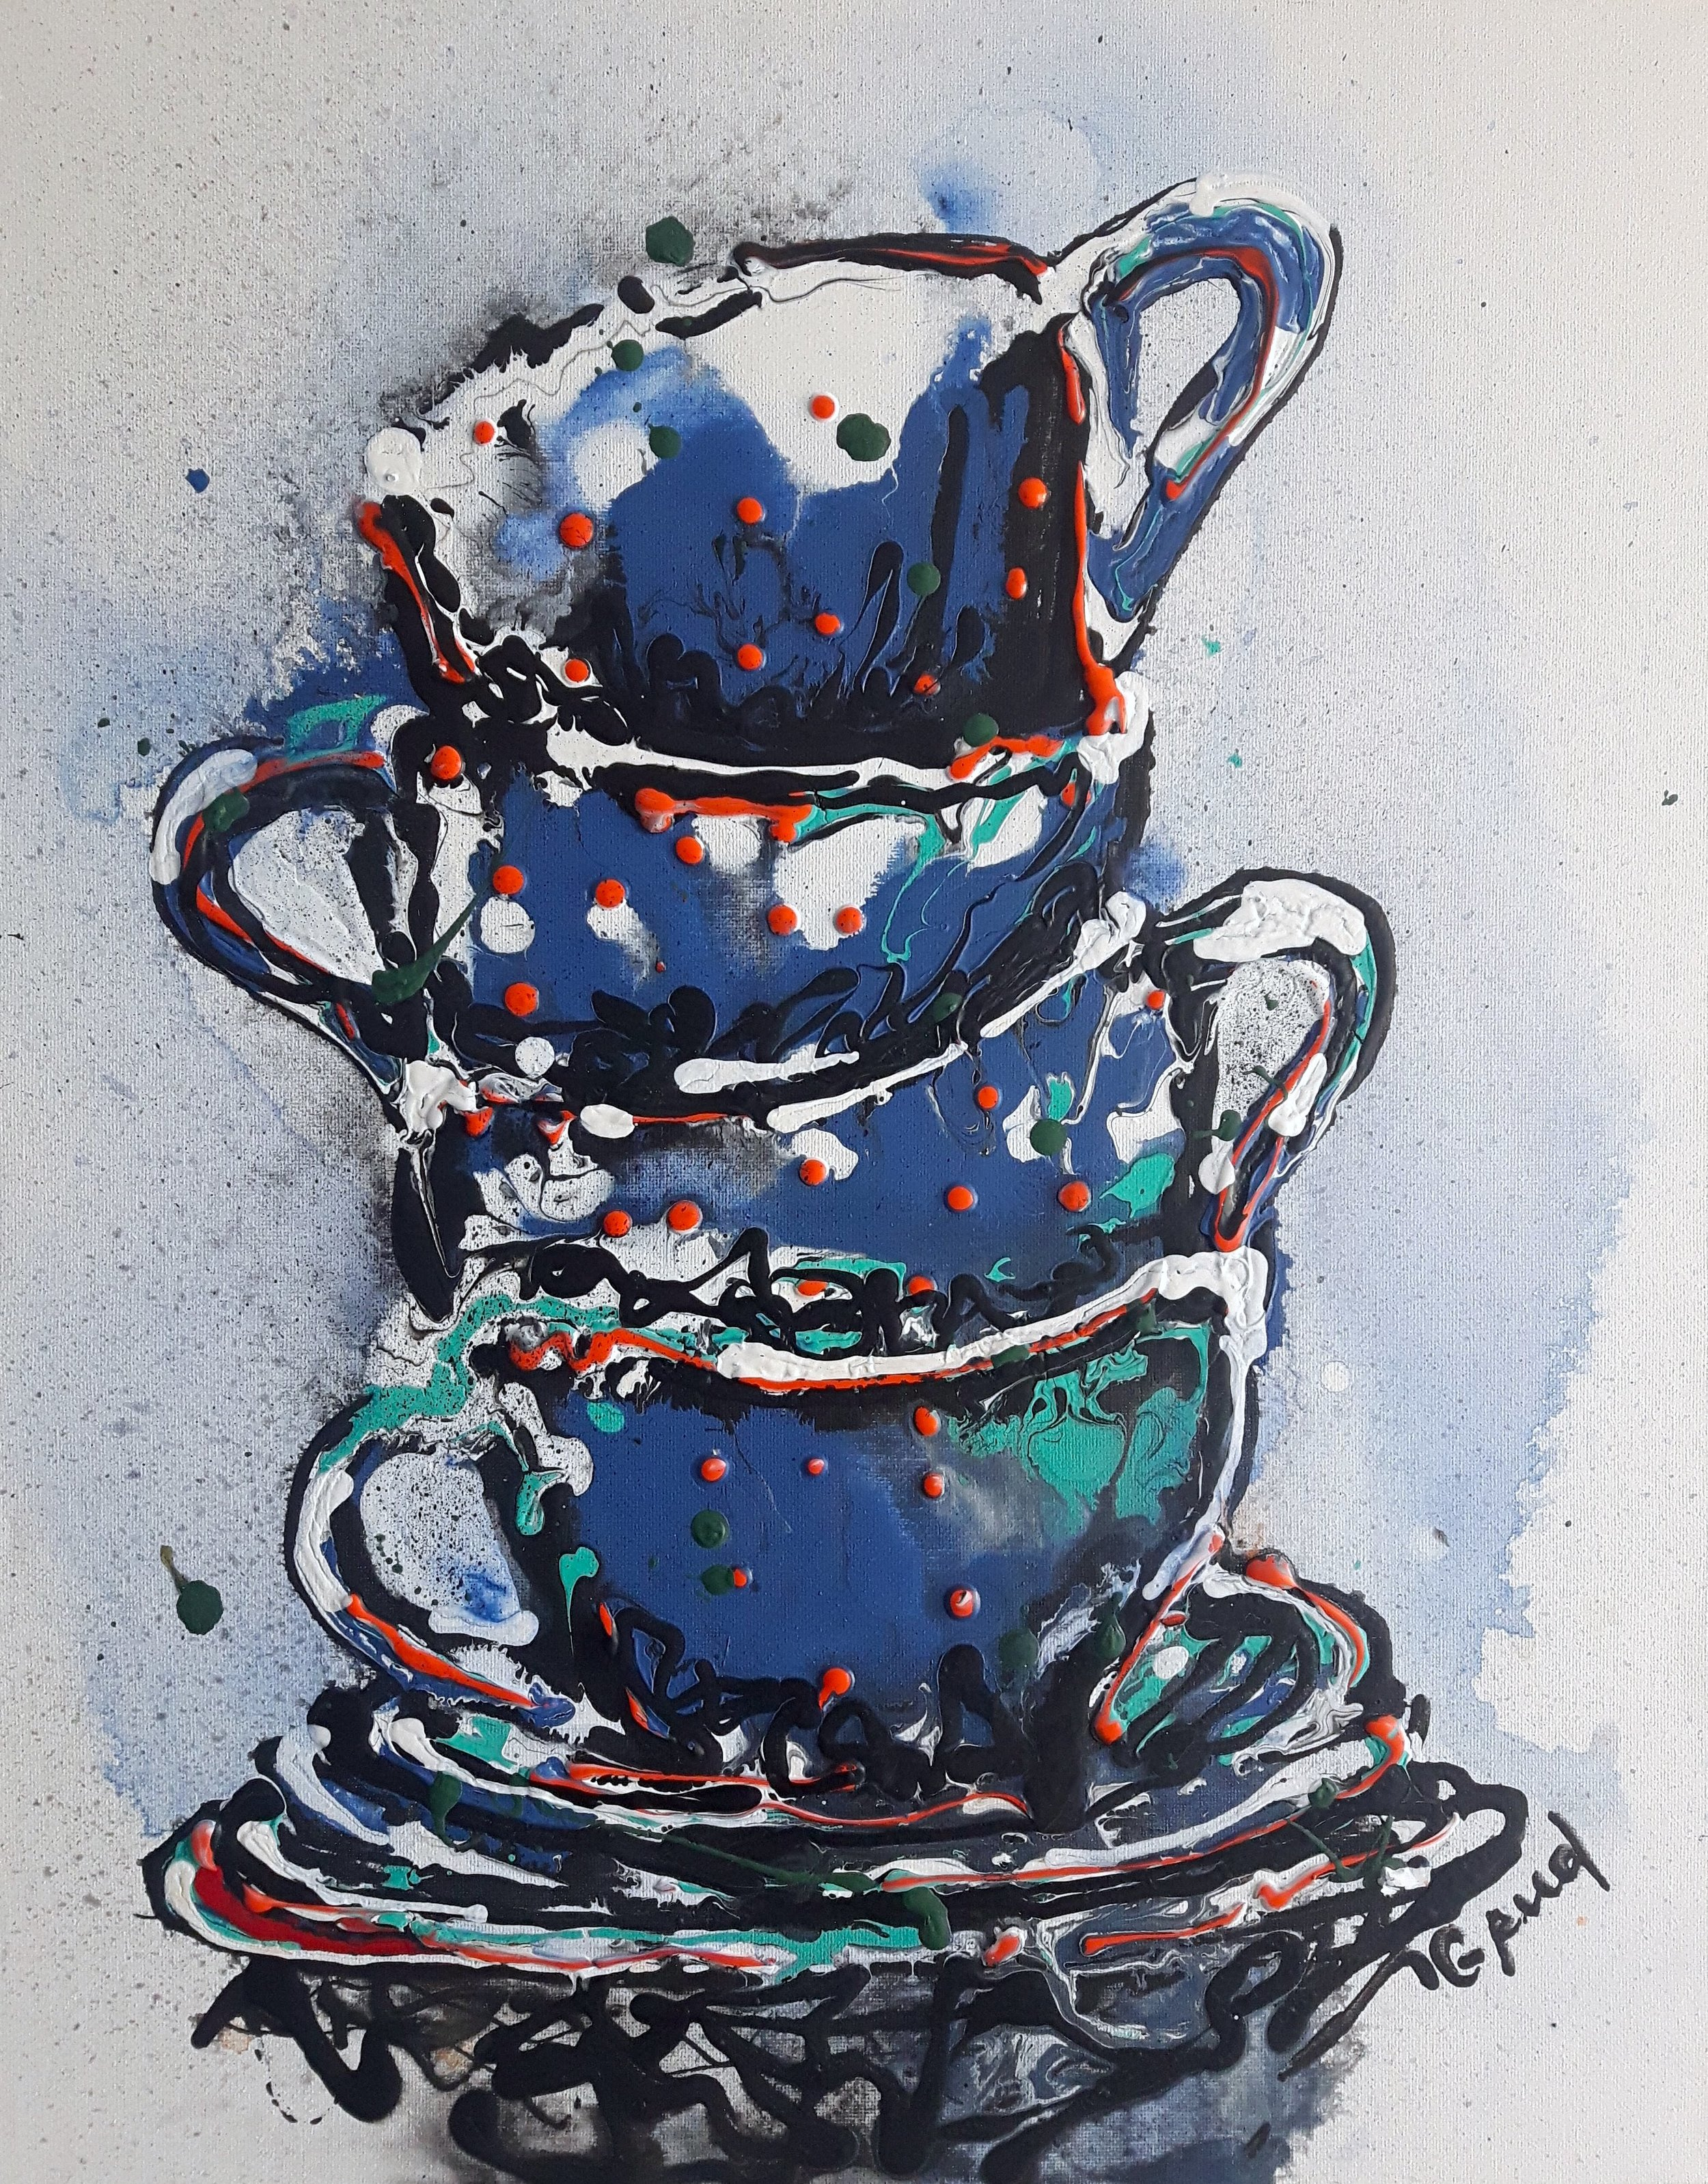 Cappuccino Cups, 20x16, Acrylic/Canvas